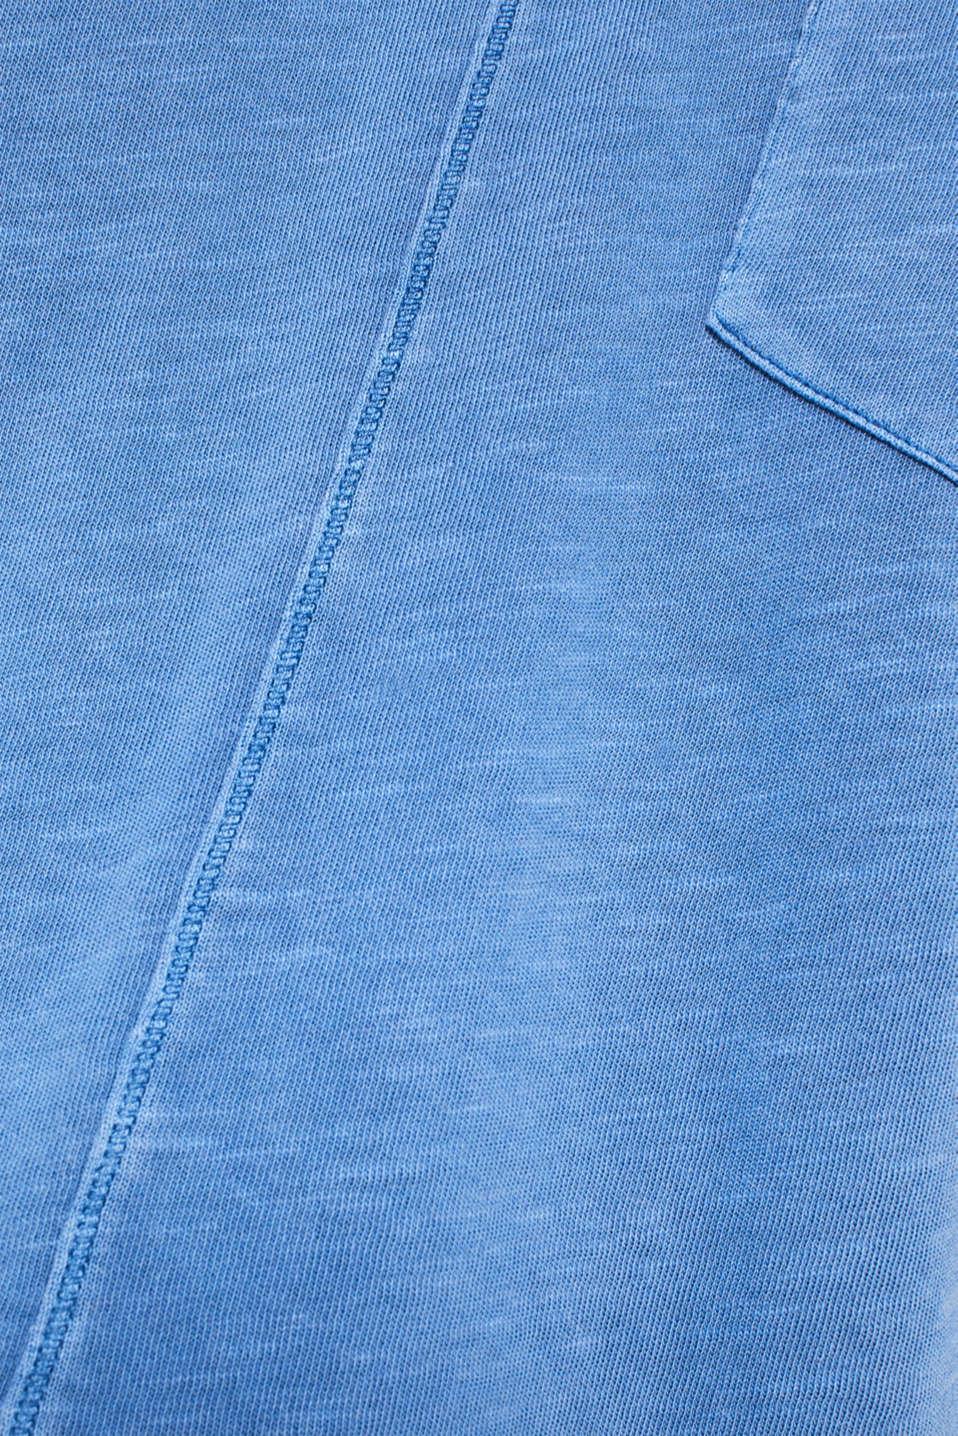 NEON slub T-shirt with a pocket, 100% cotton, BRIGHT BLUE, detail image number 4